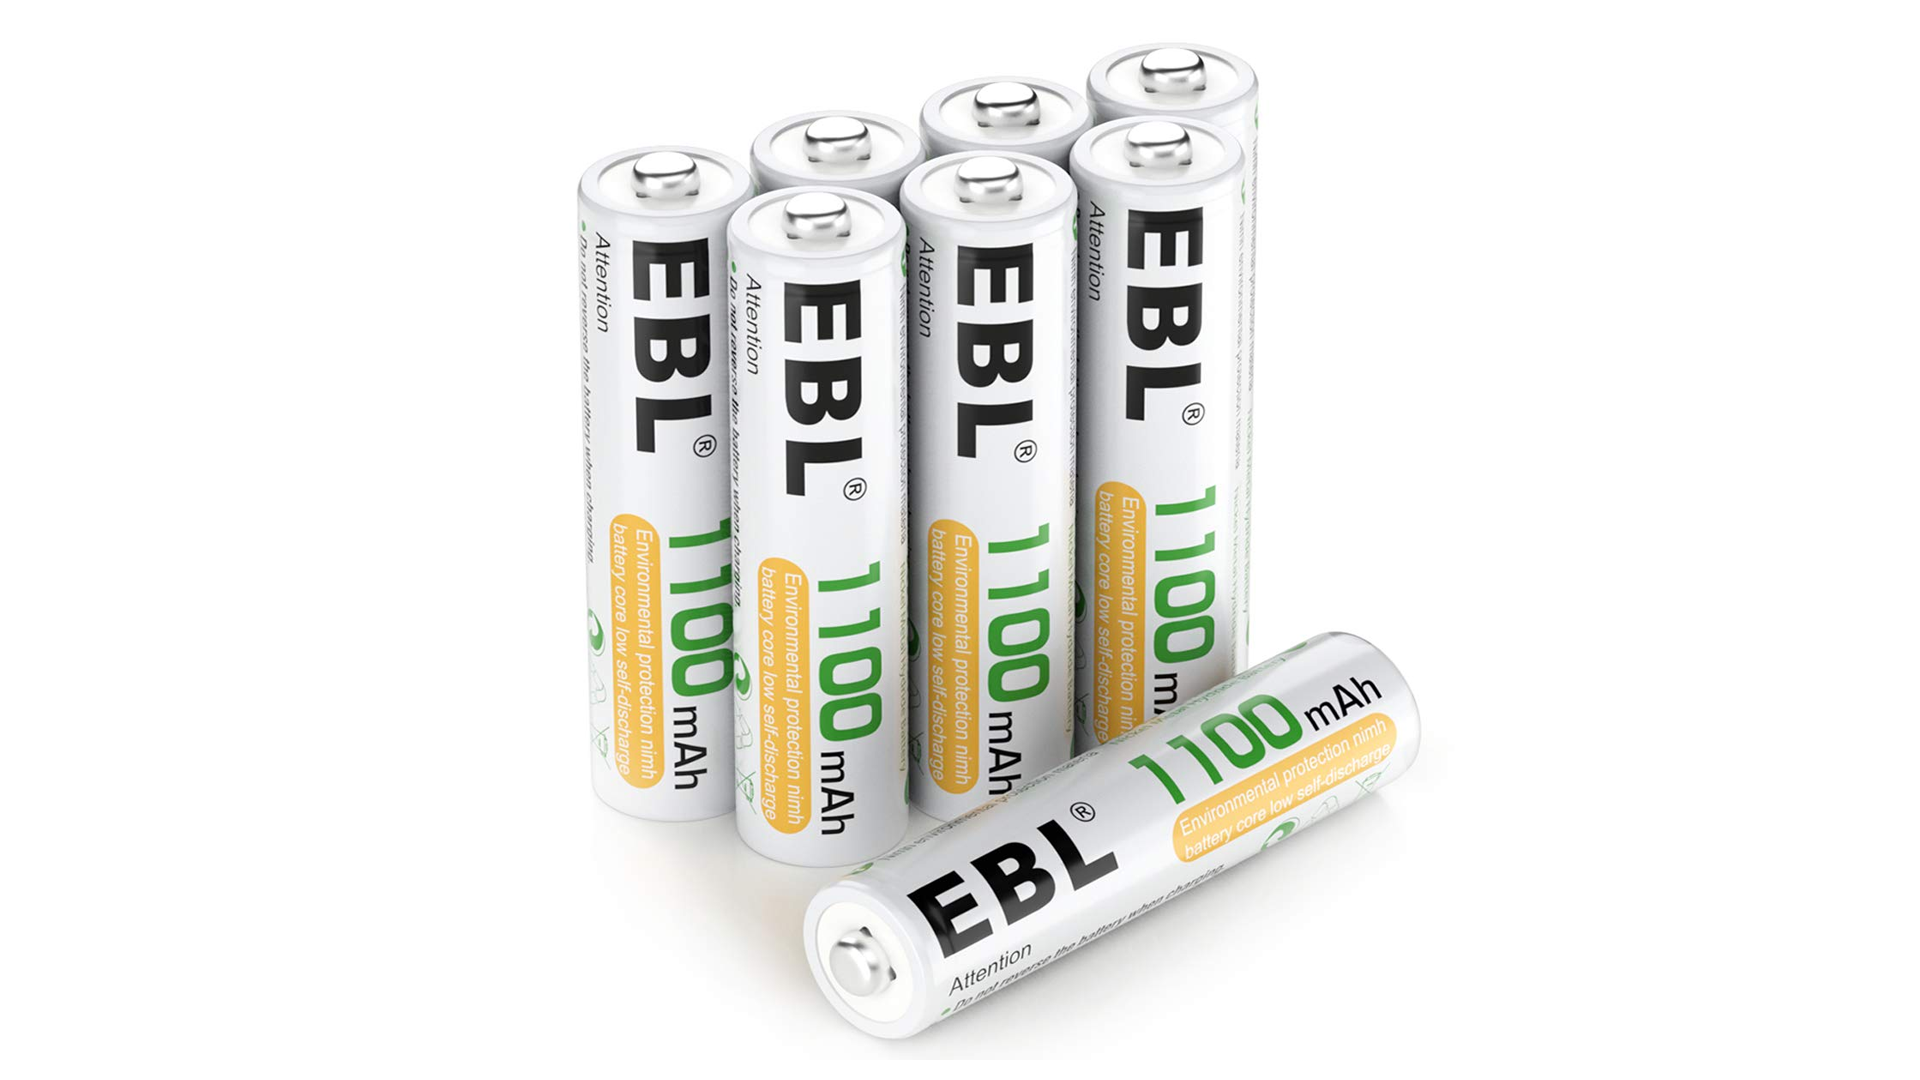 EBL rechargable AAA batteries